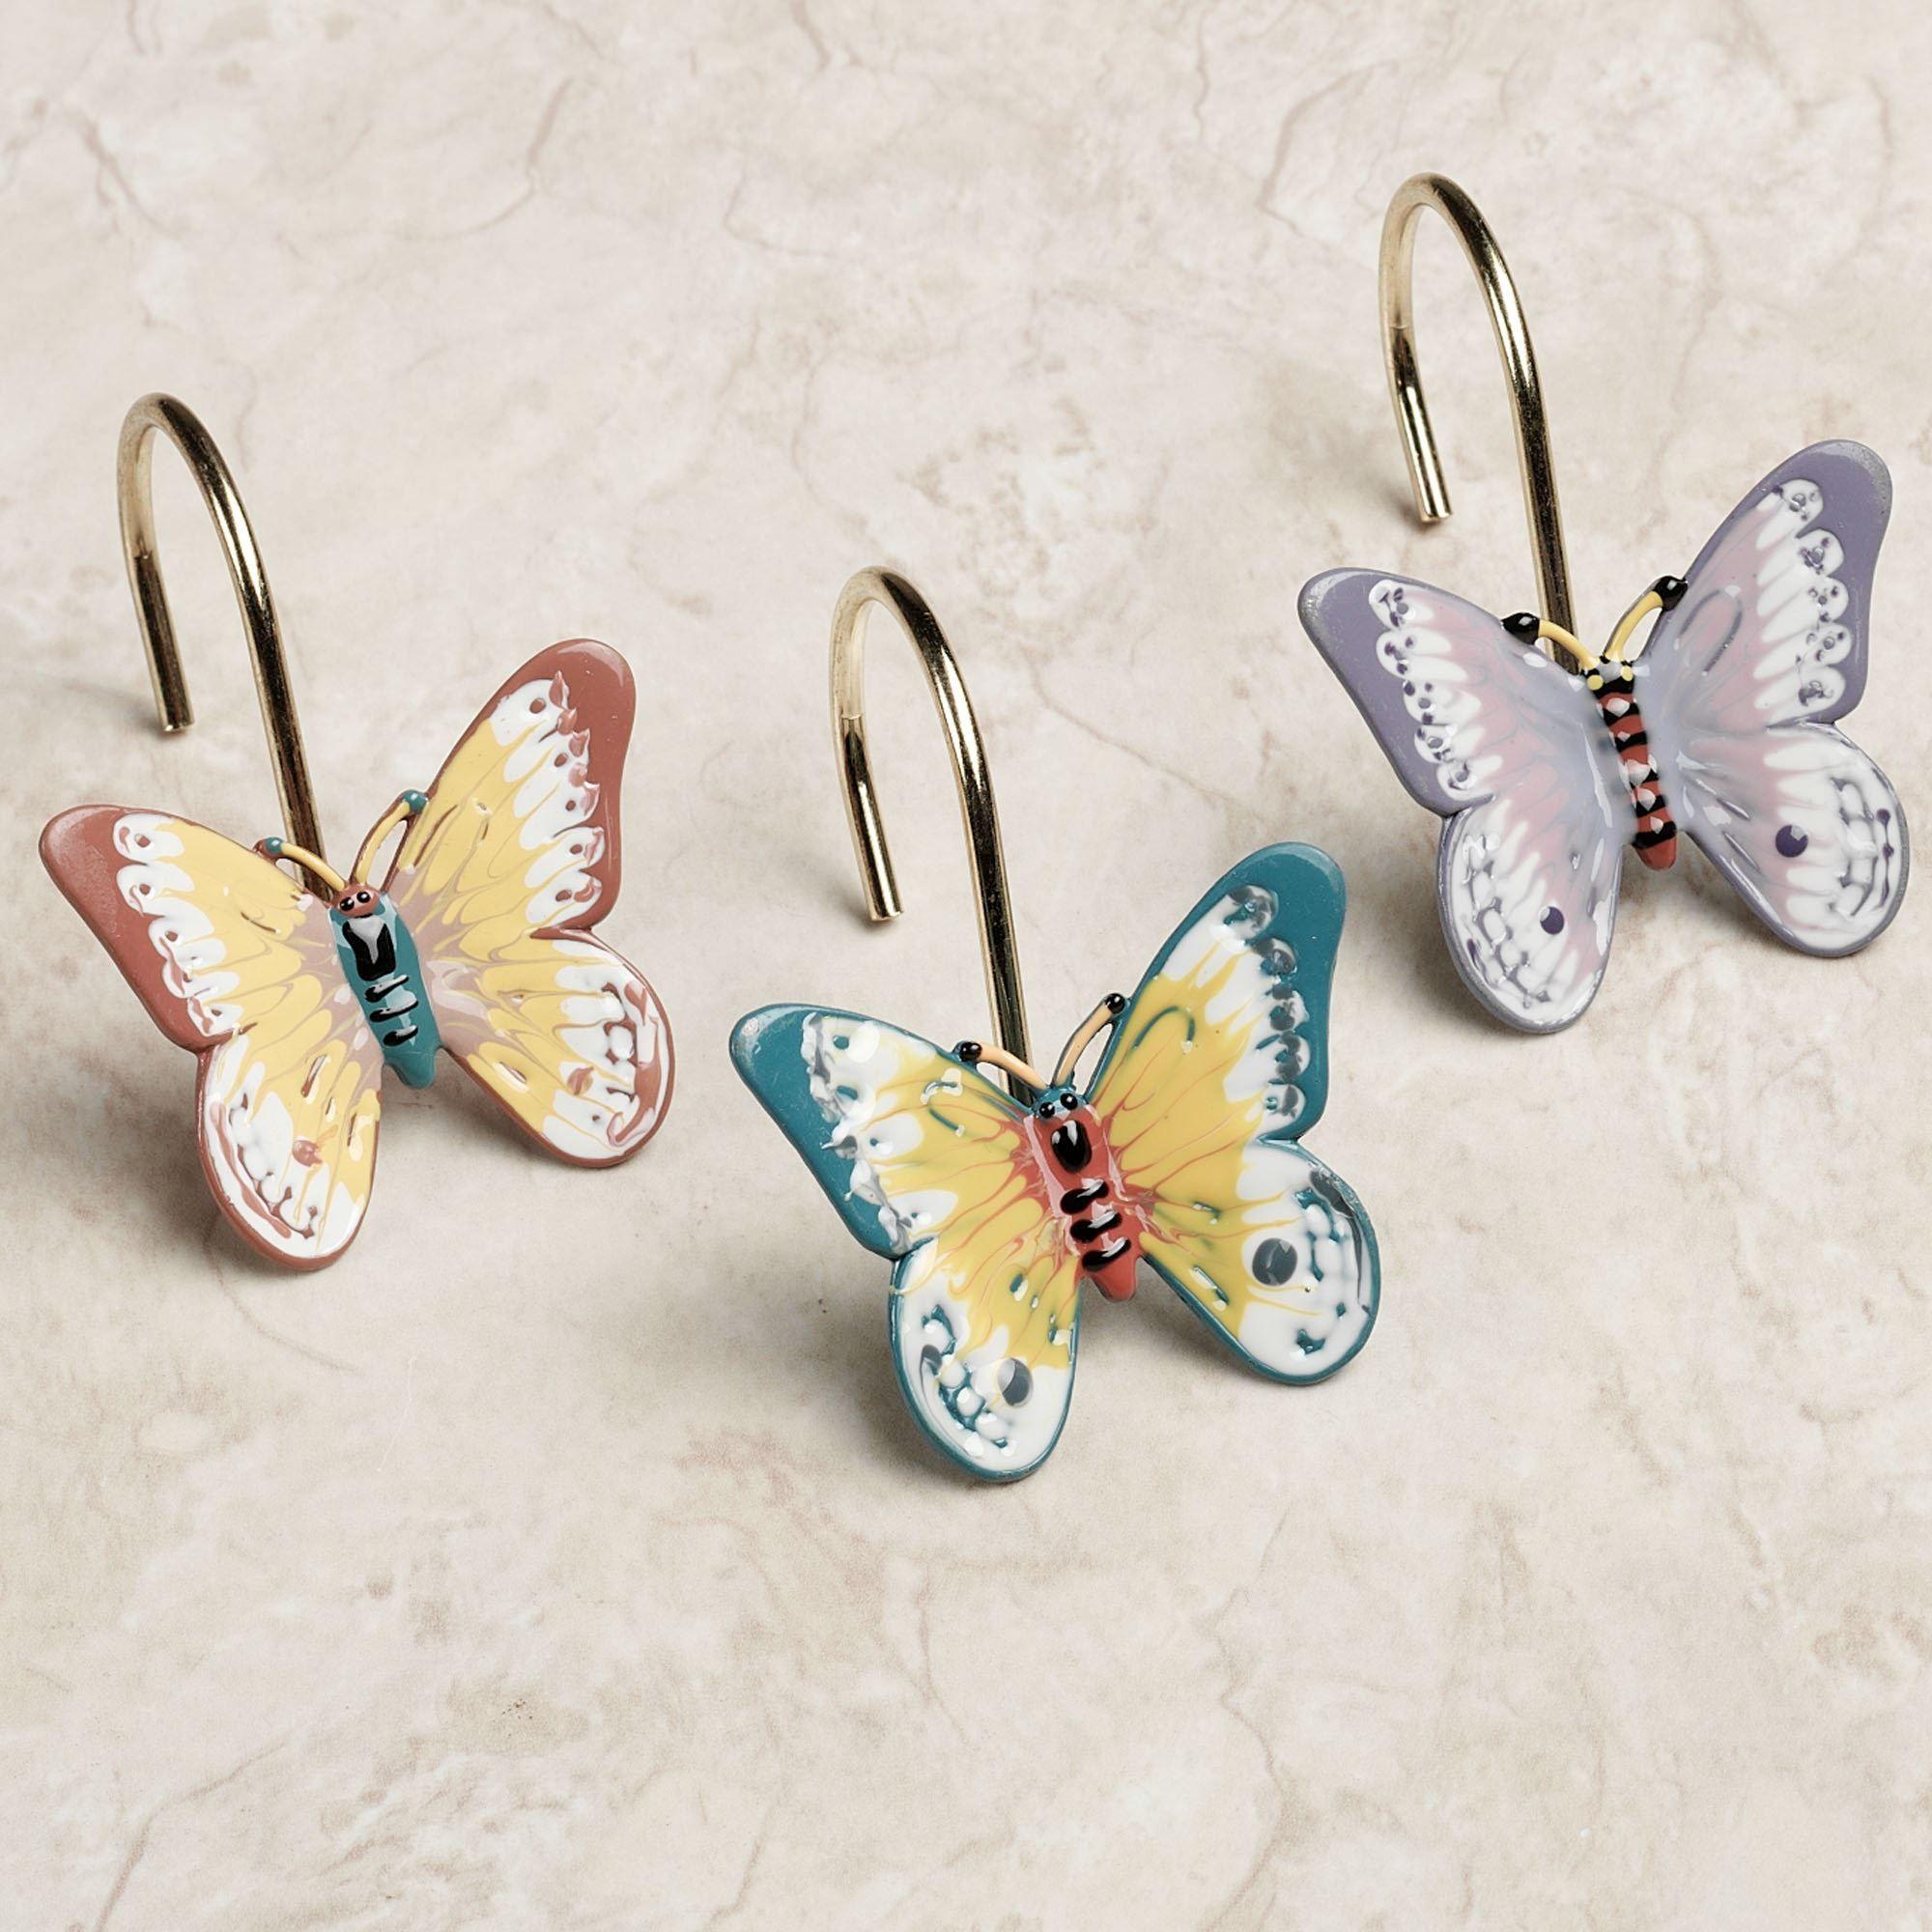 Butterfly Meadow Shower Curtain Hook Set Multi Pastel Of Twelve